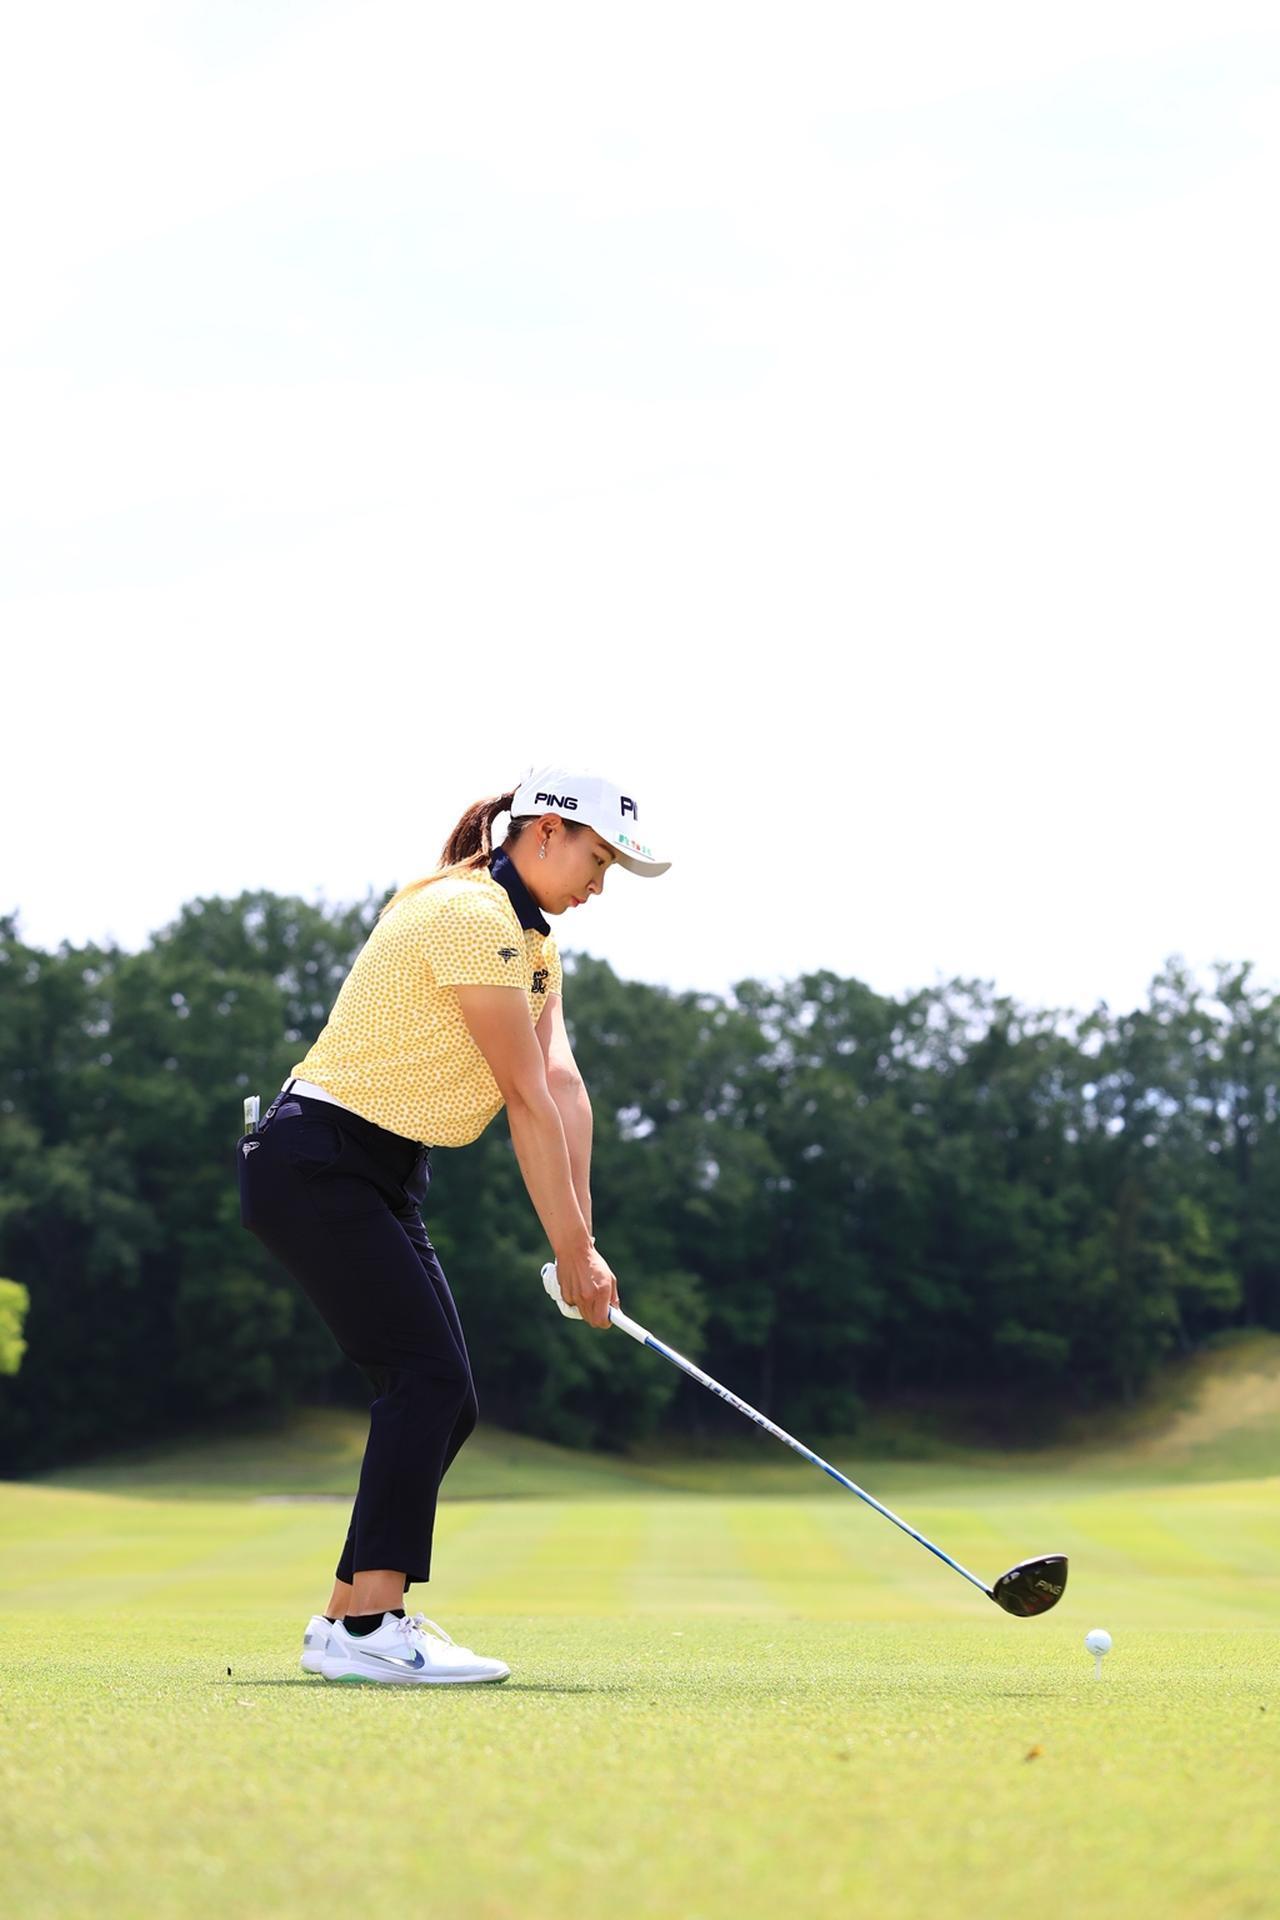 Images : 2番目の画像 - 渋野日向子のドライバー後方連続写真 - みんなのゴルフダイジェスト